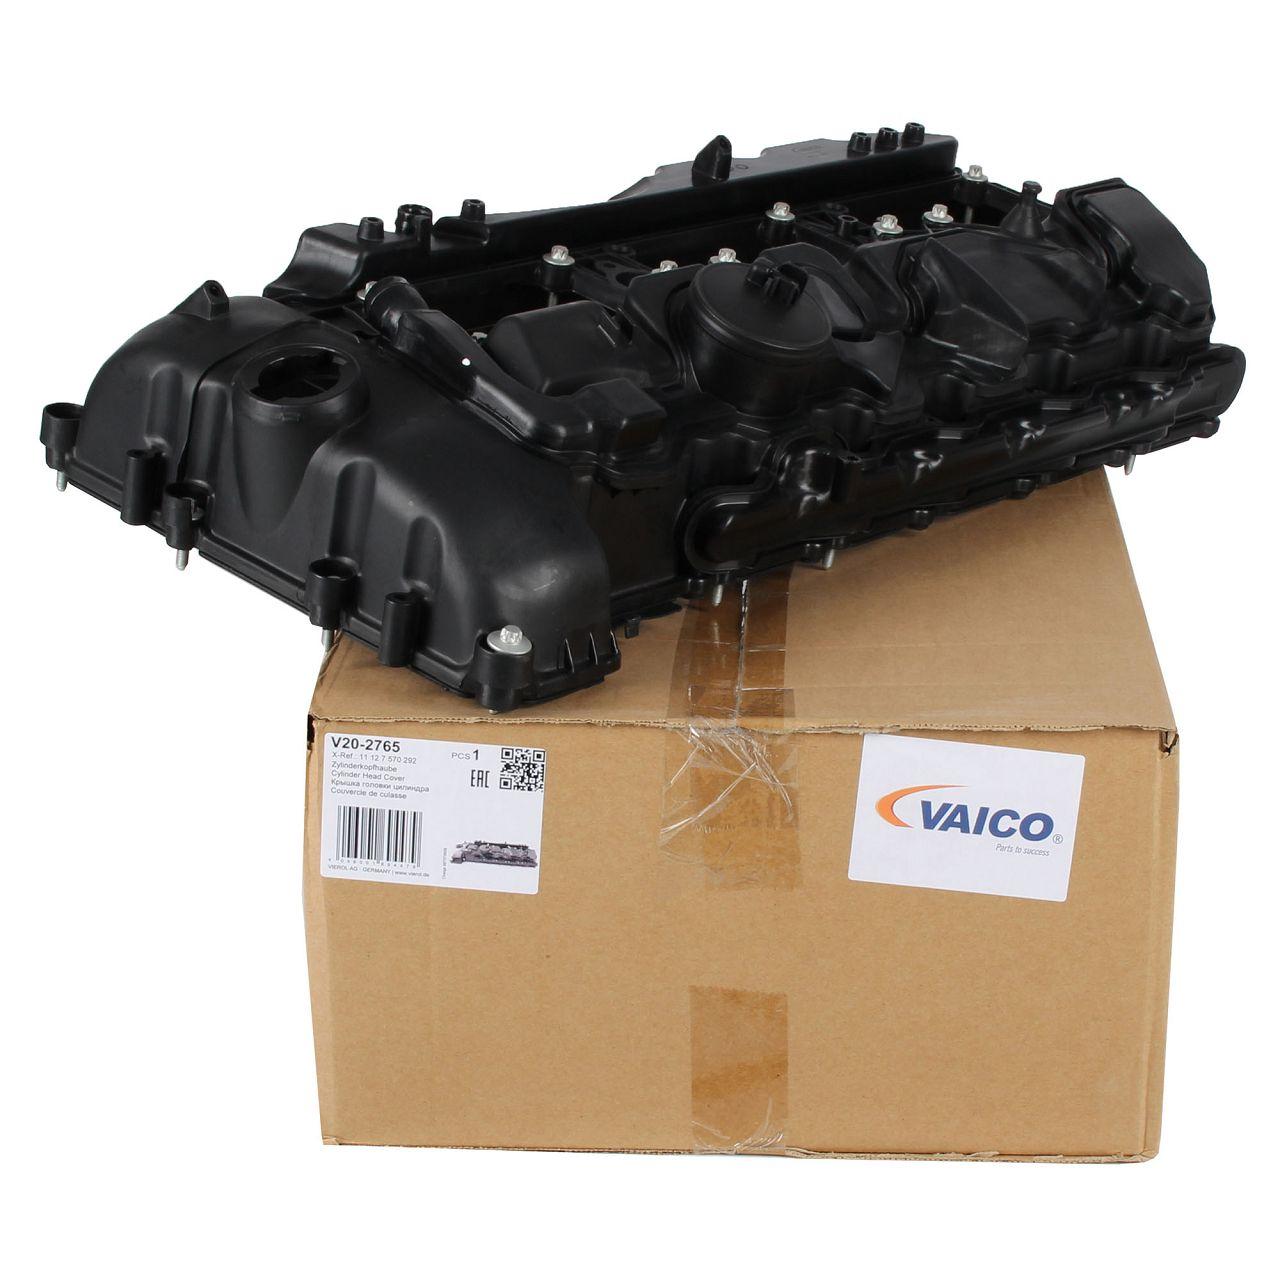 VAICO Ventildeckel + Ventildeckeldichtung BMW M135i 235i M2 335i 435i 535i 640i N54 N55